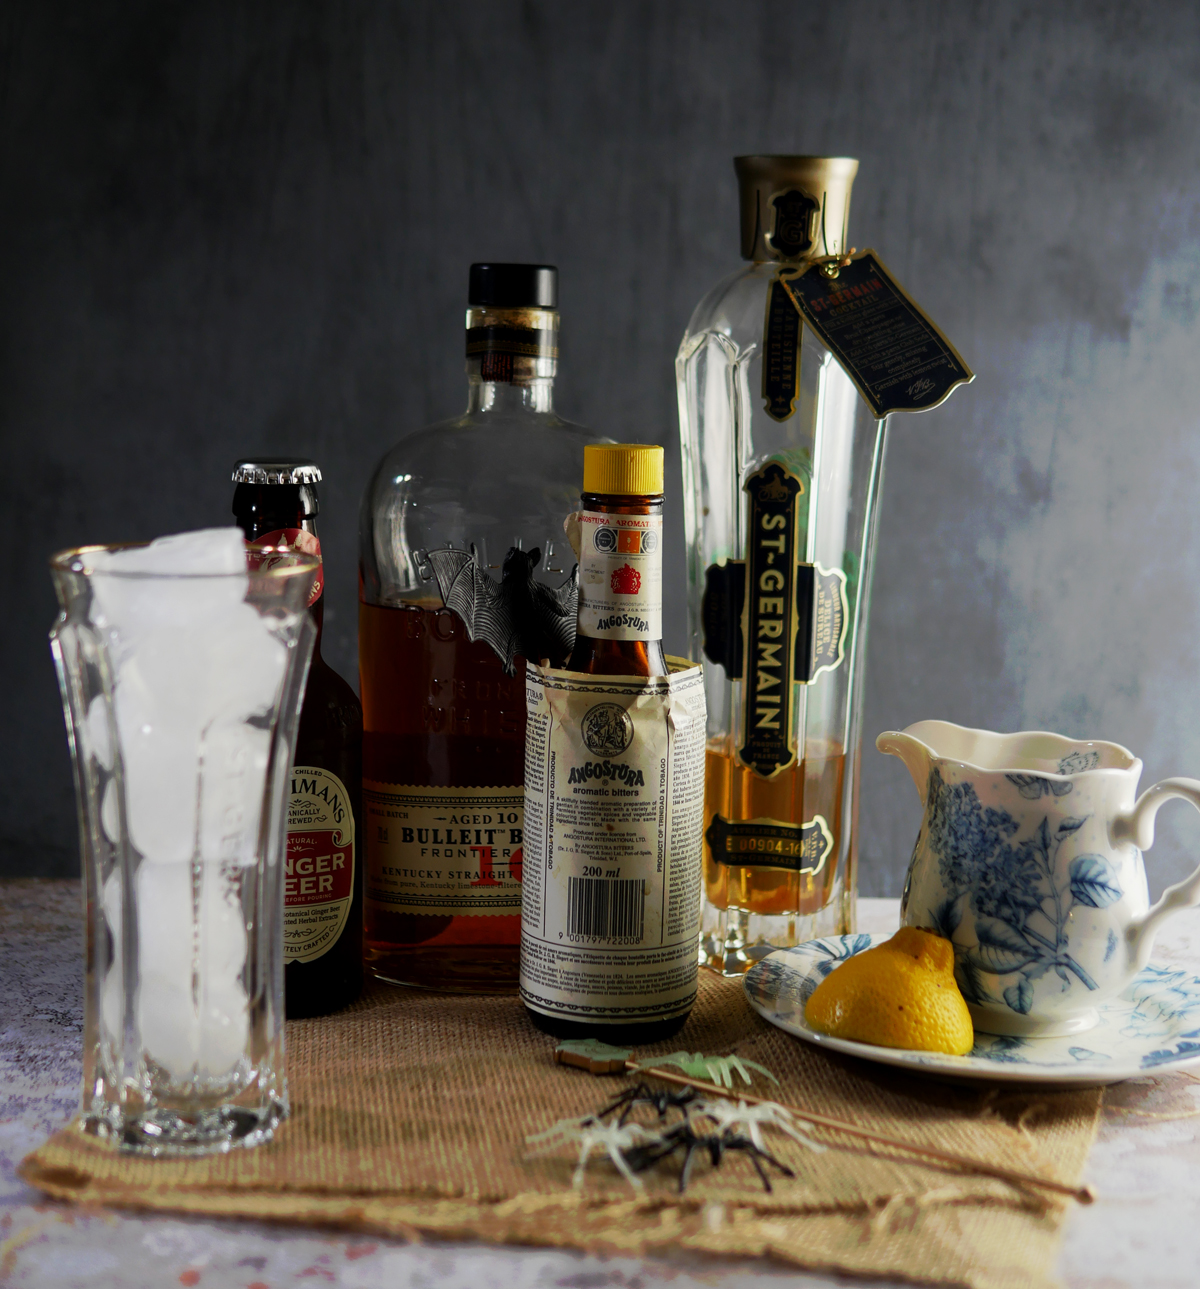 Ingredients for Skeleton Key Cocktail